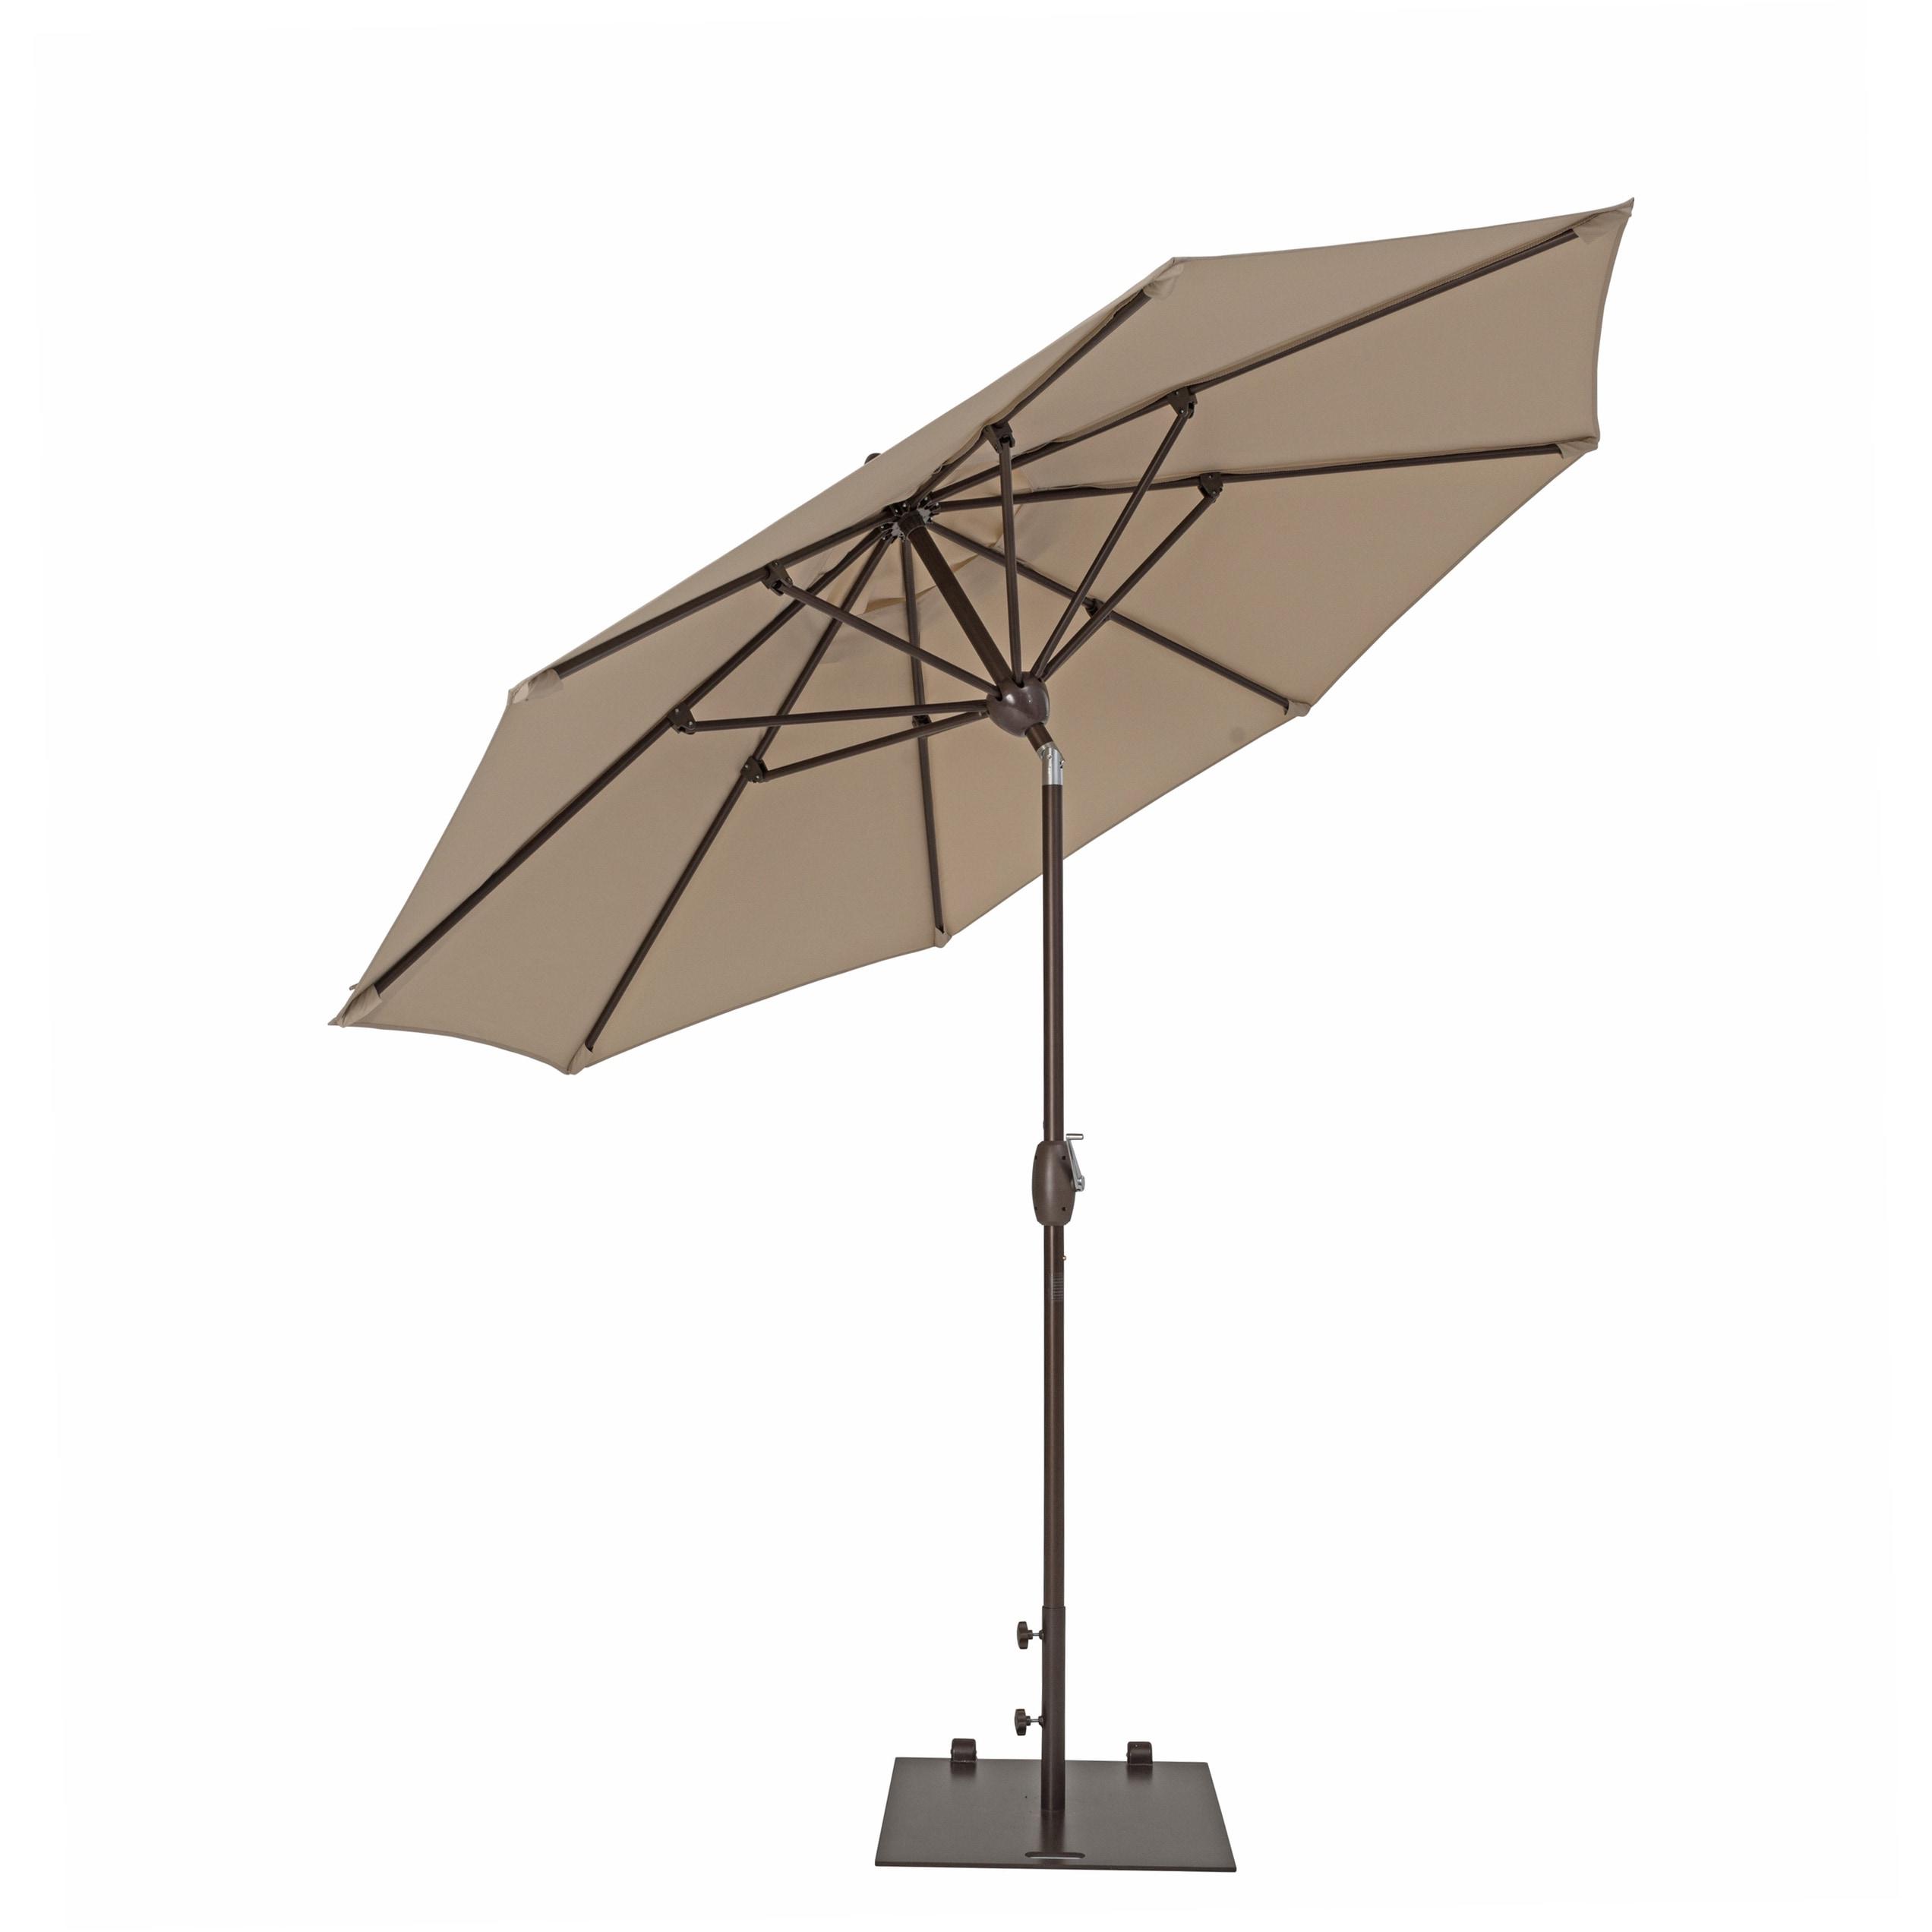 Dena Rectangular Market Umbrellas With Regard To 2020 Trueshade Plus 9 Foot Market Umbrella With Push Button Tilt (Jockey (View 7 of 20)